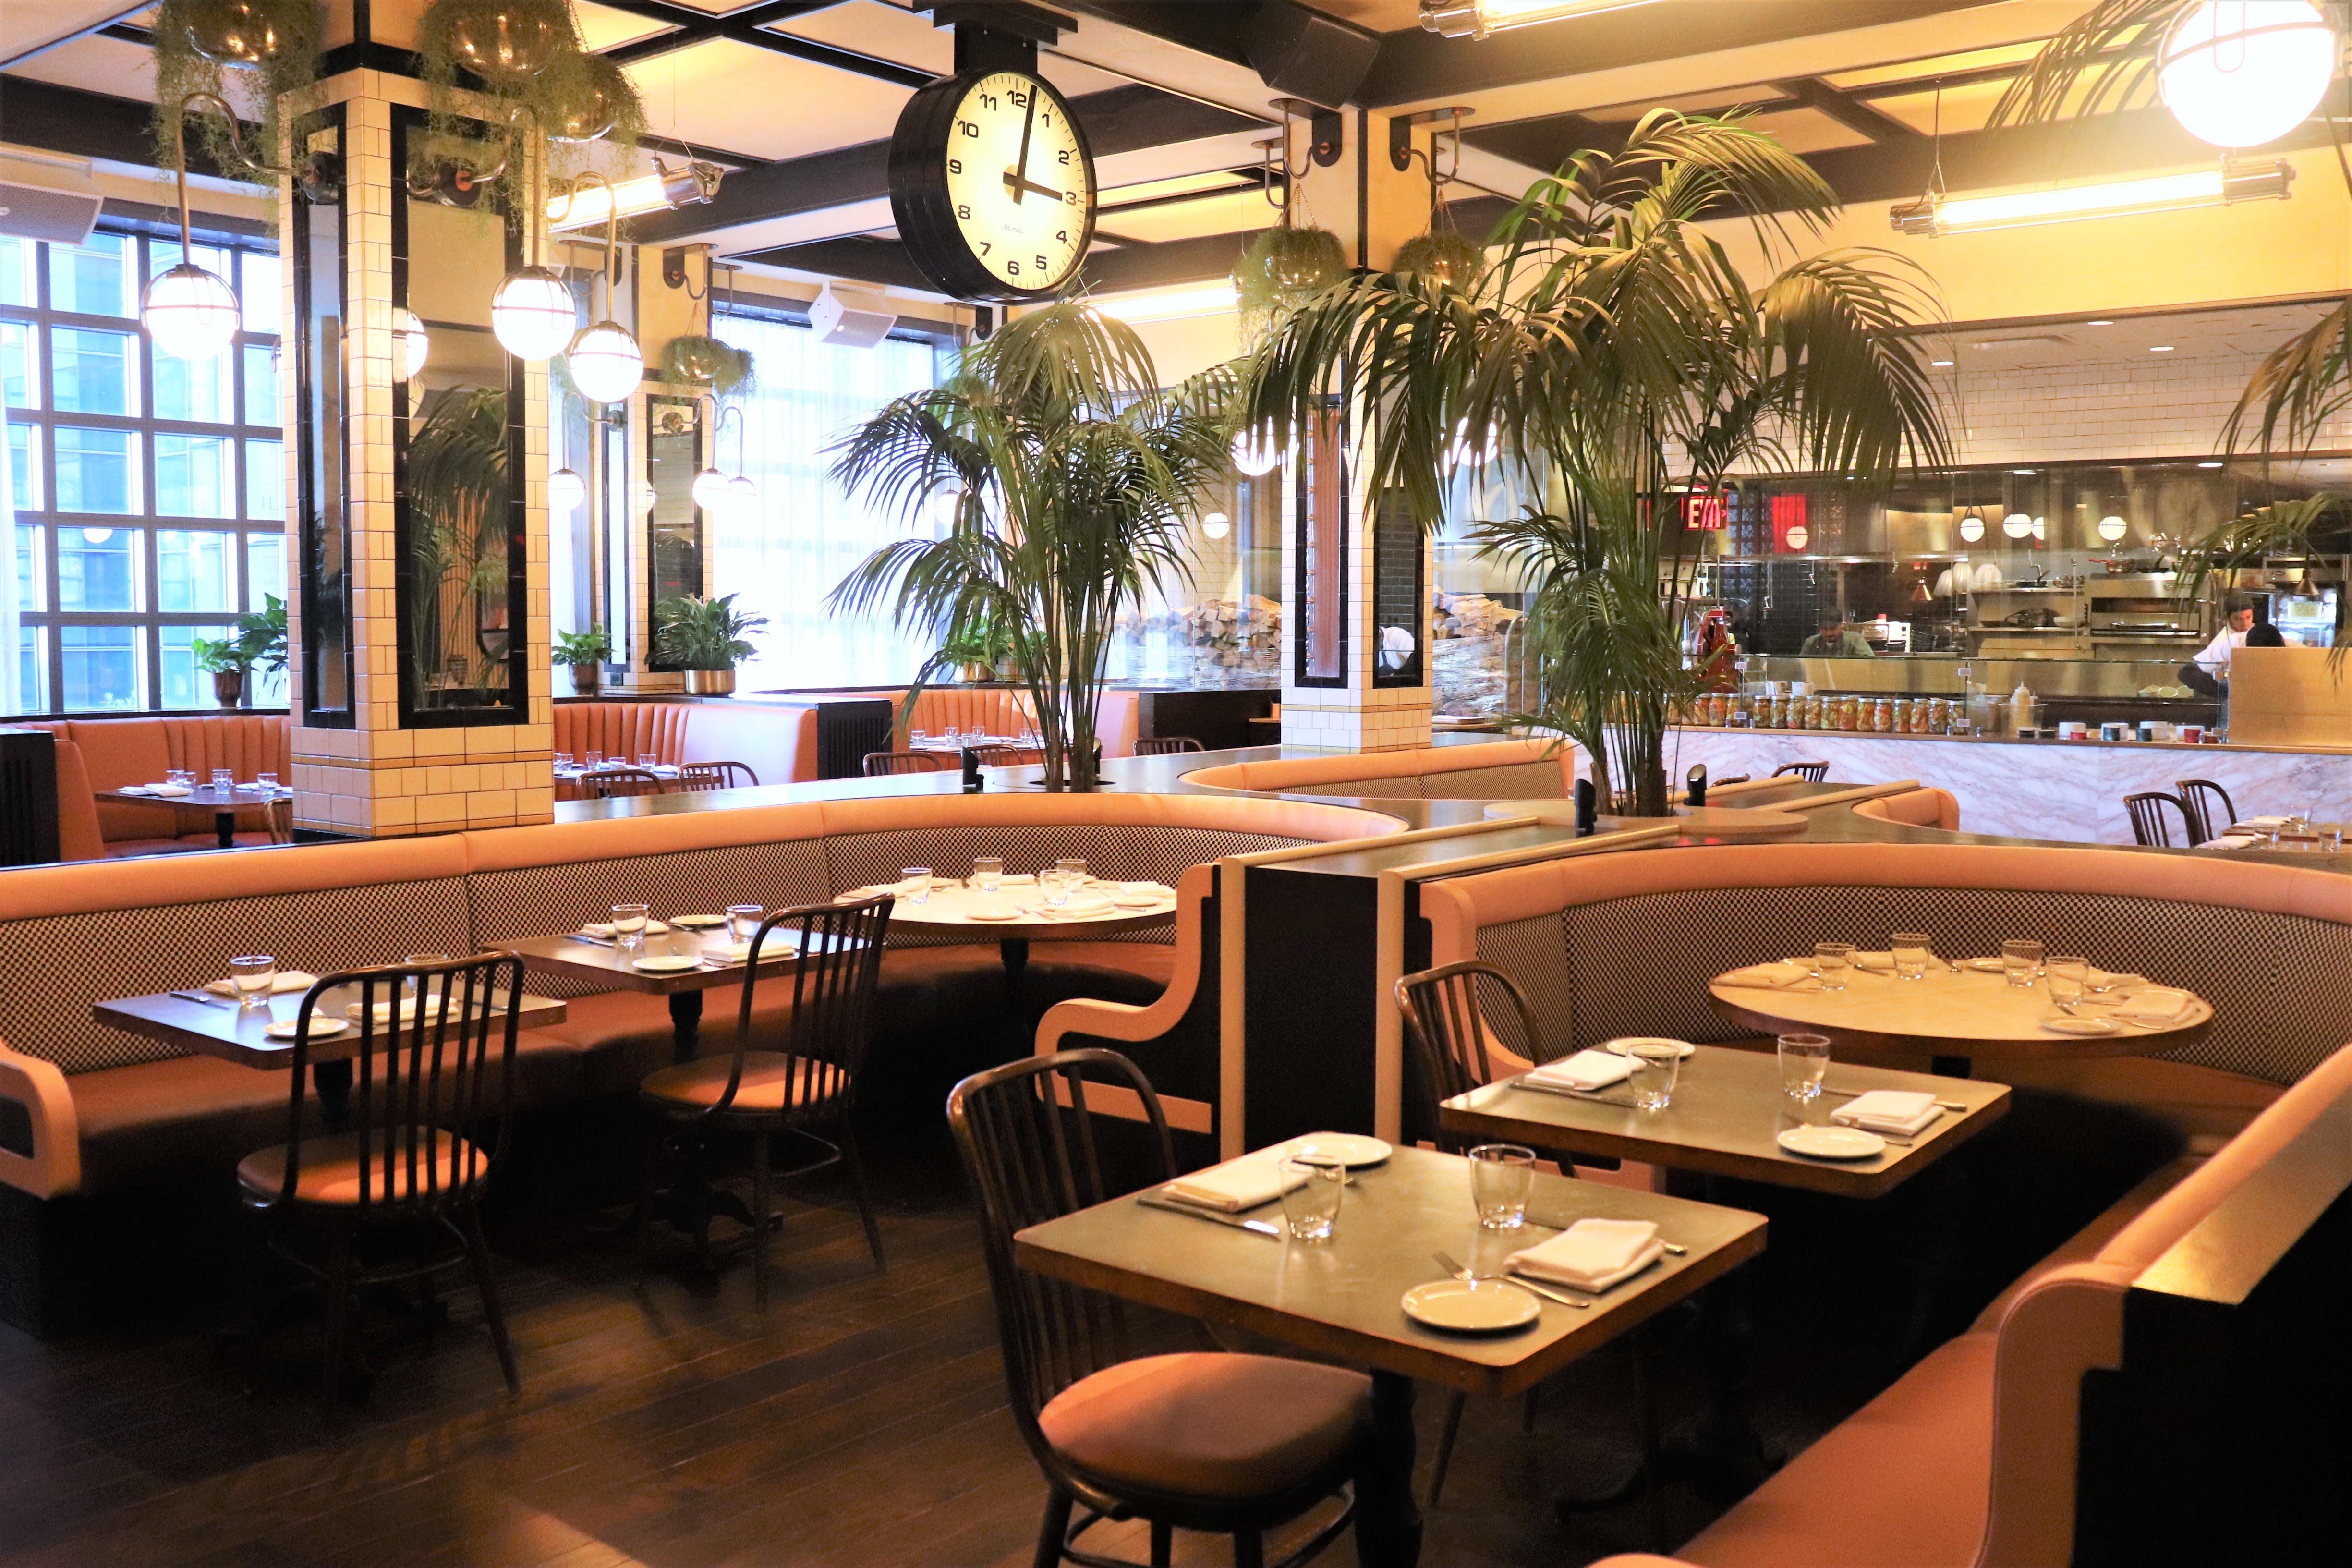 Rochambeau dining area